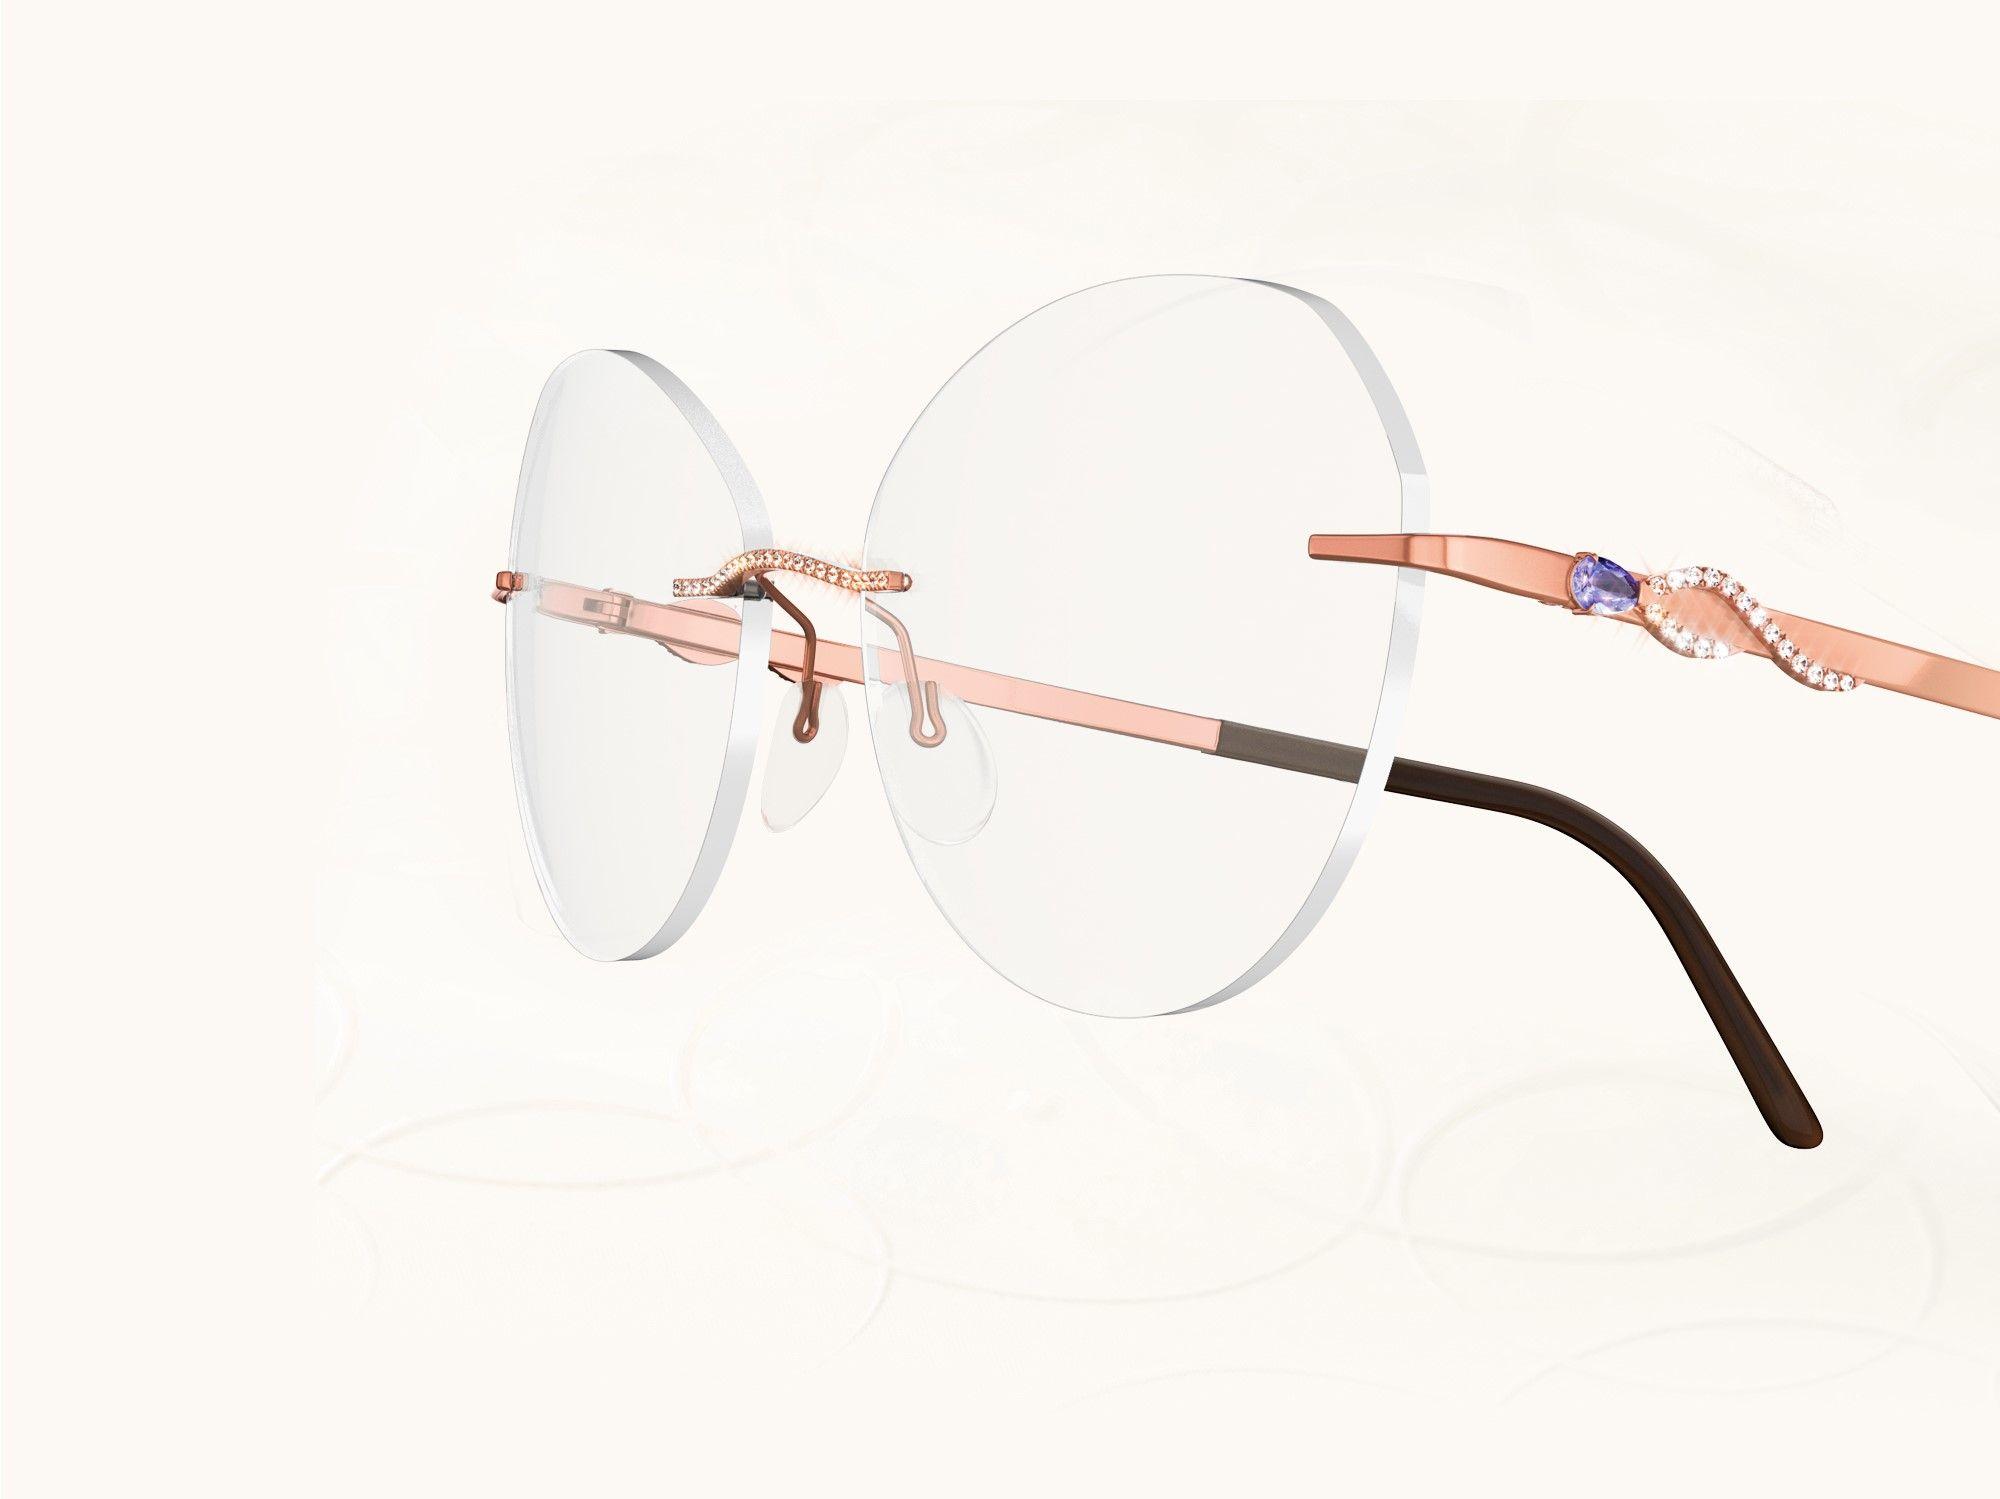 Handmade Eyewear | Atelier Collection